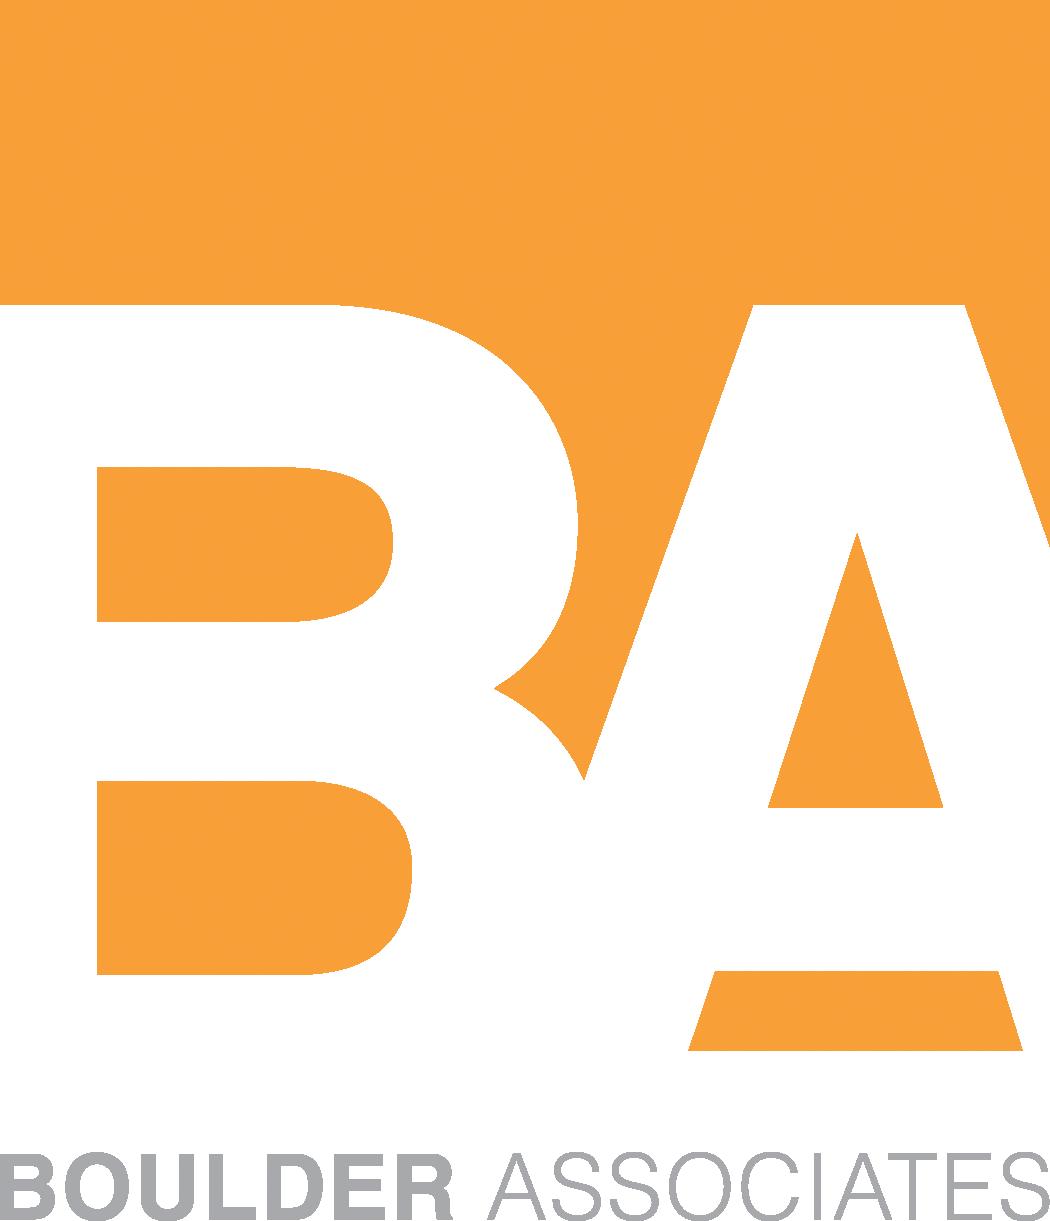 Boulder Associates